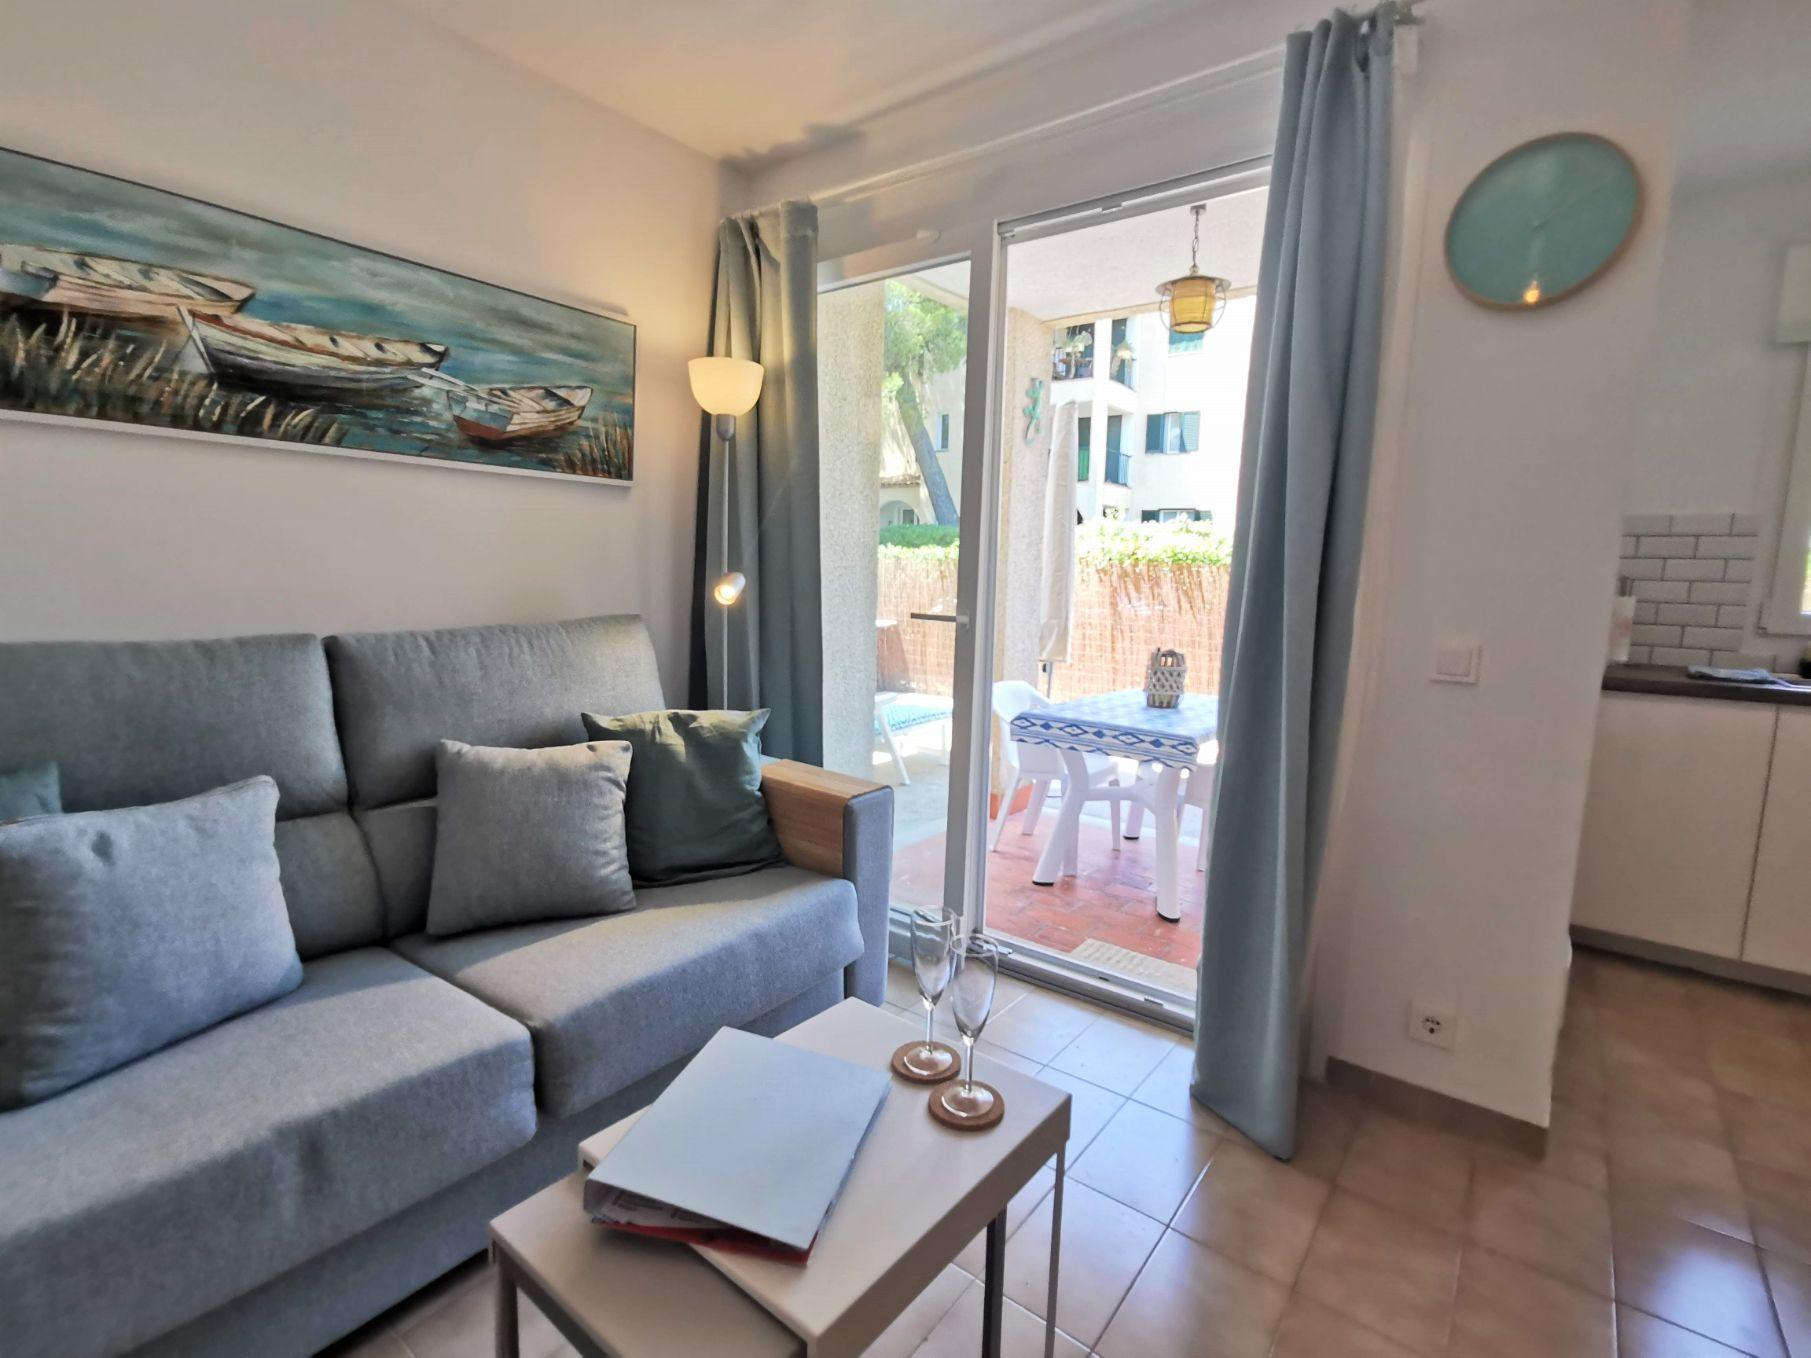 Ground floor modern holiday apartment in Puerto Pollensa Mallorca